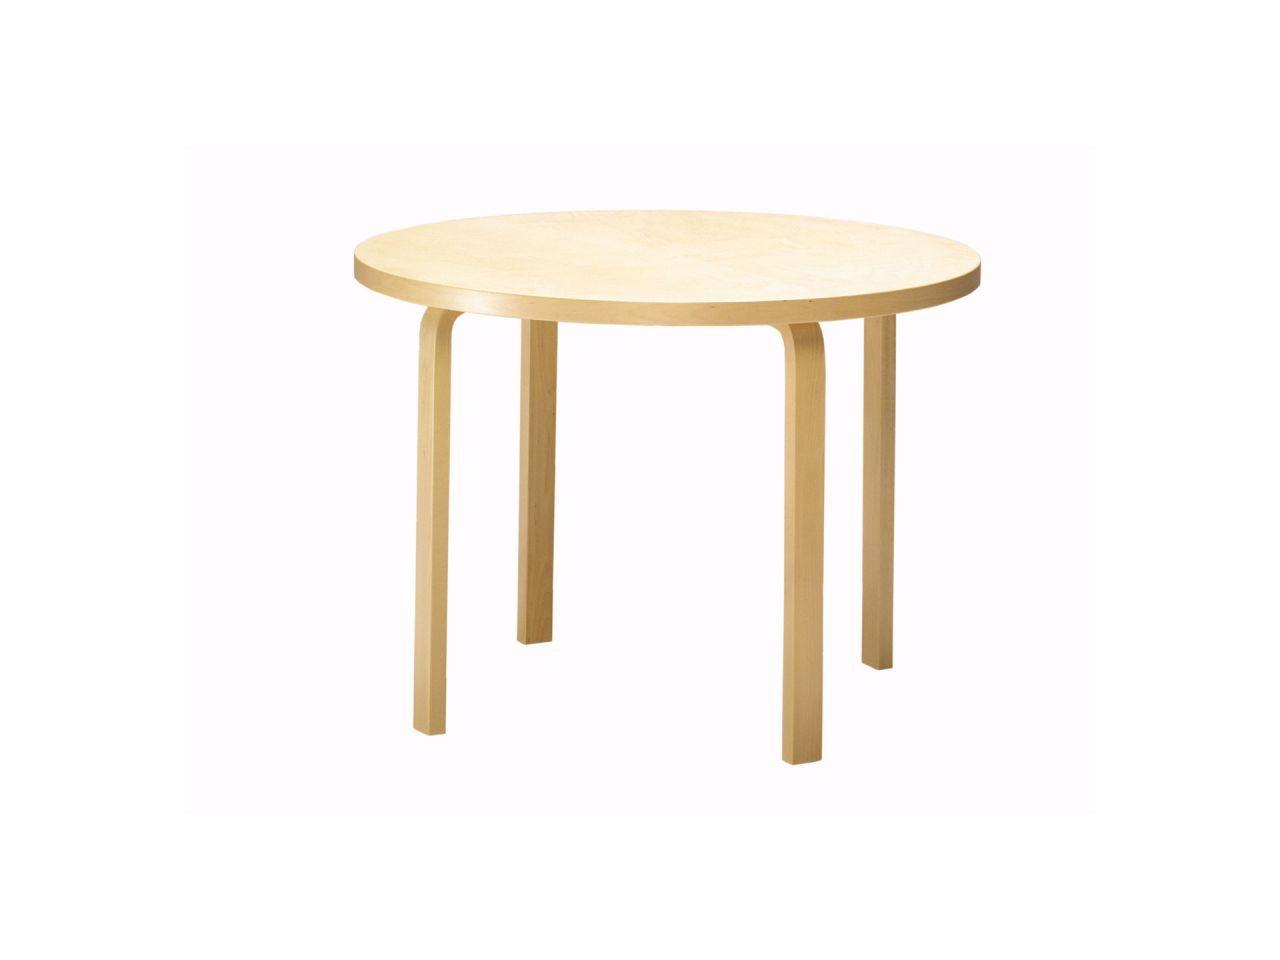 Artek - Tuotteet - Pöydät - PÖYTÄ 90A 100 cm